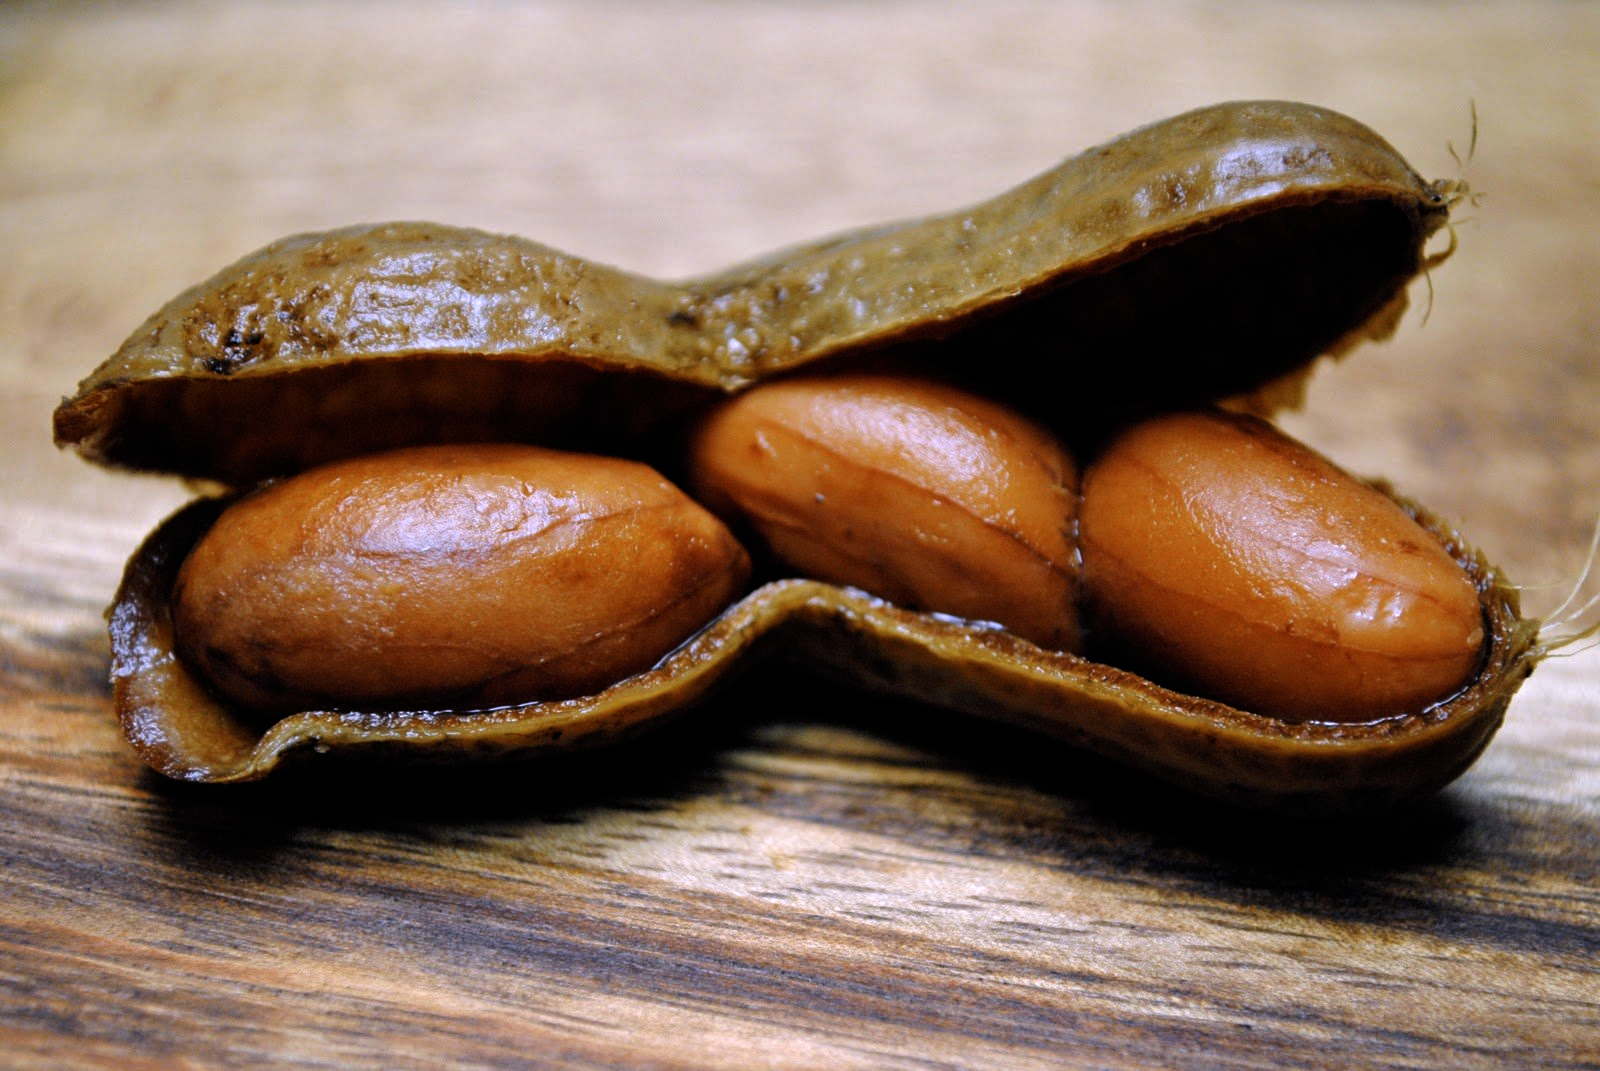 Ass-Kickin' Boiled Peanuts